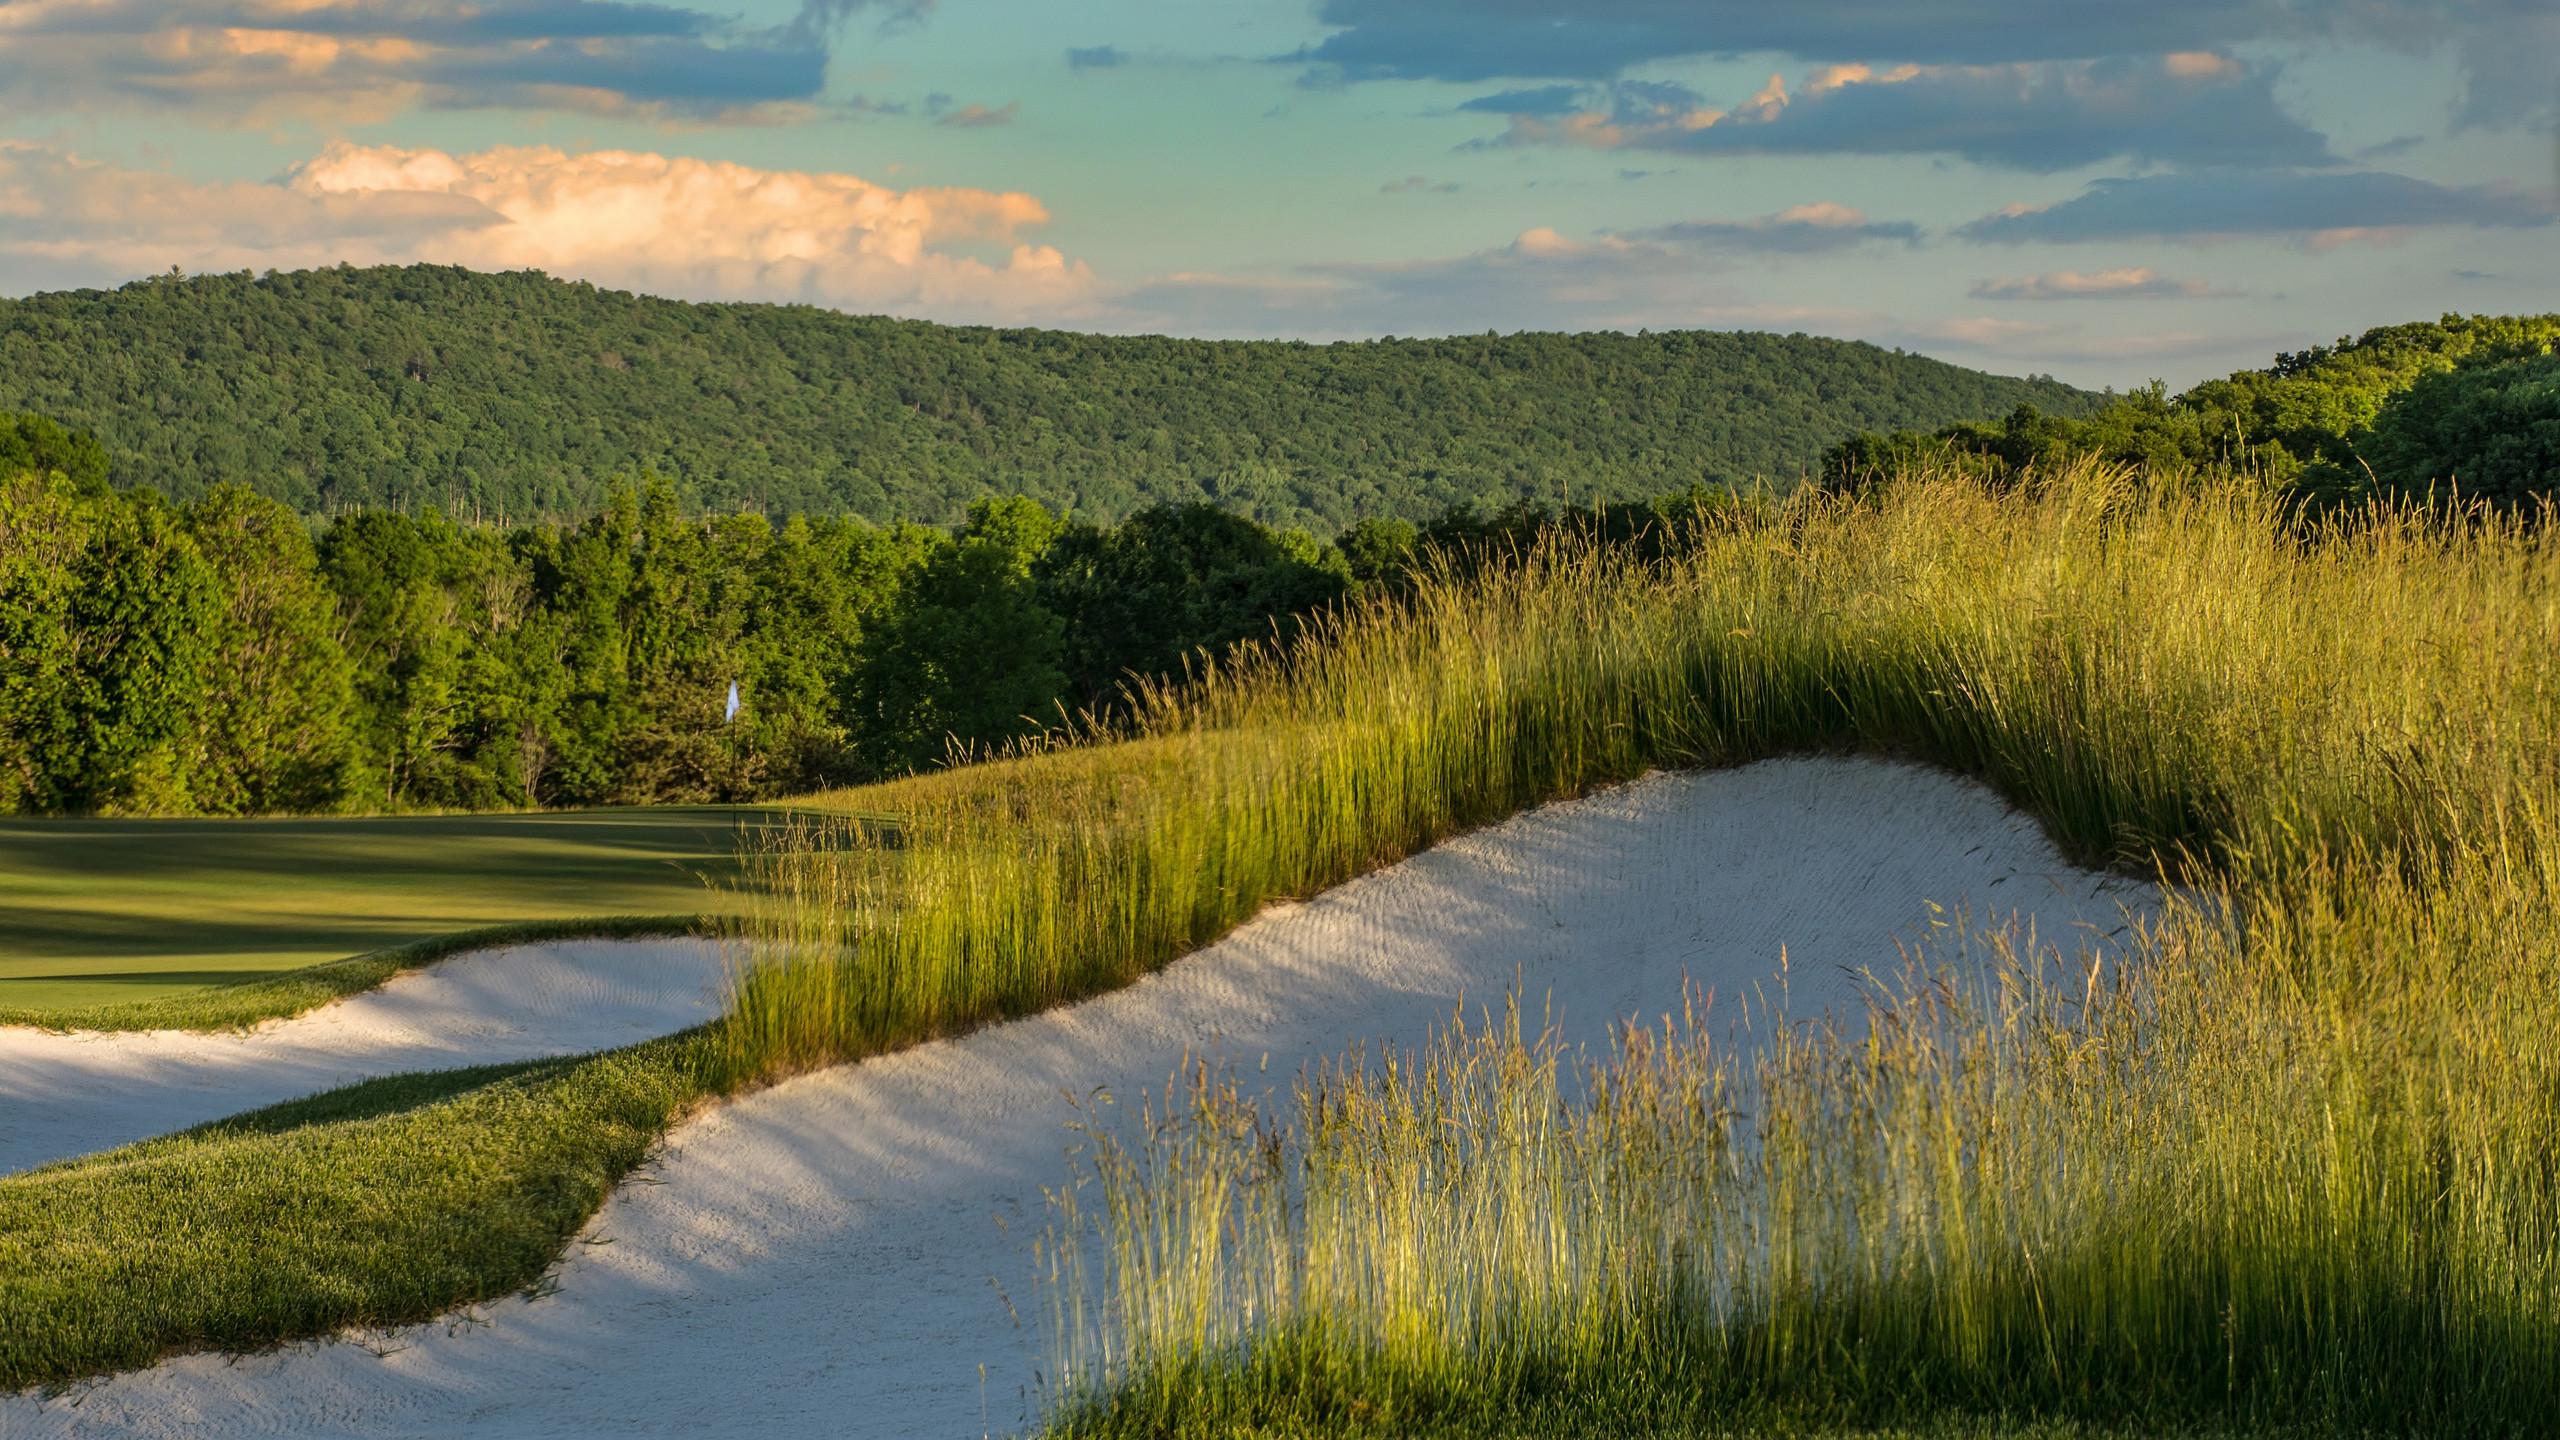 Silo Ridge Golf Course